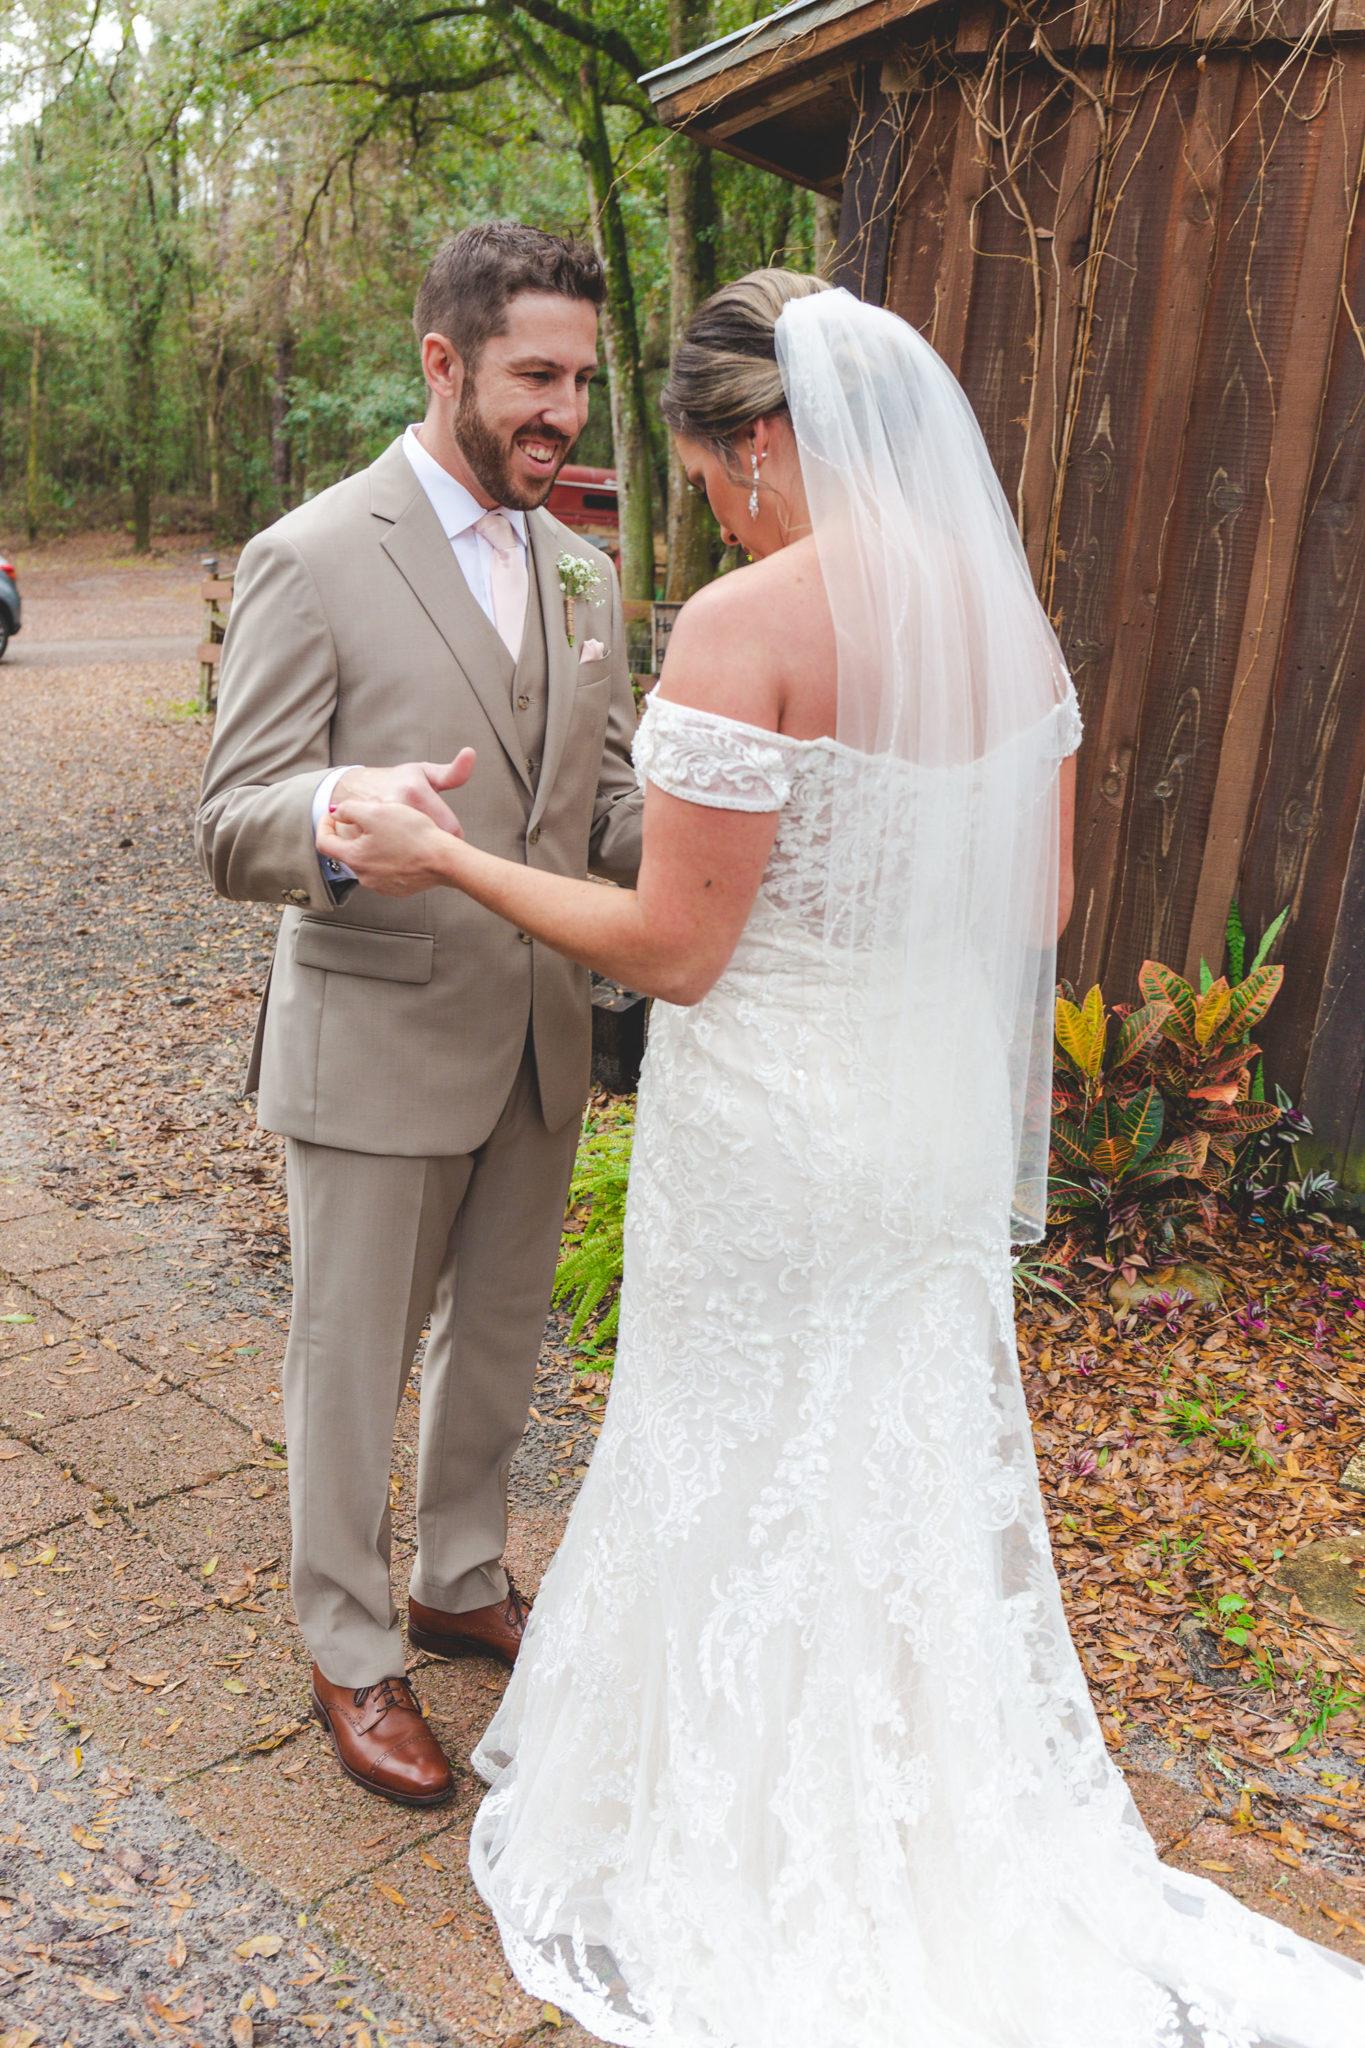 Groom admiring his gorgeous bride.